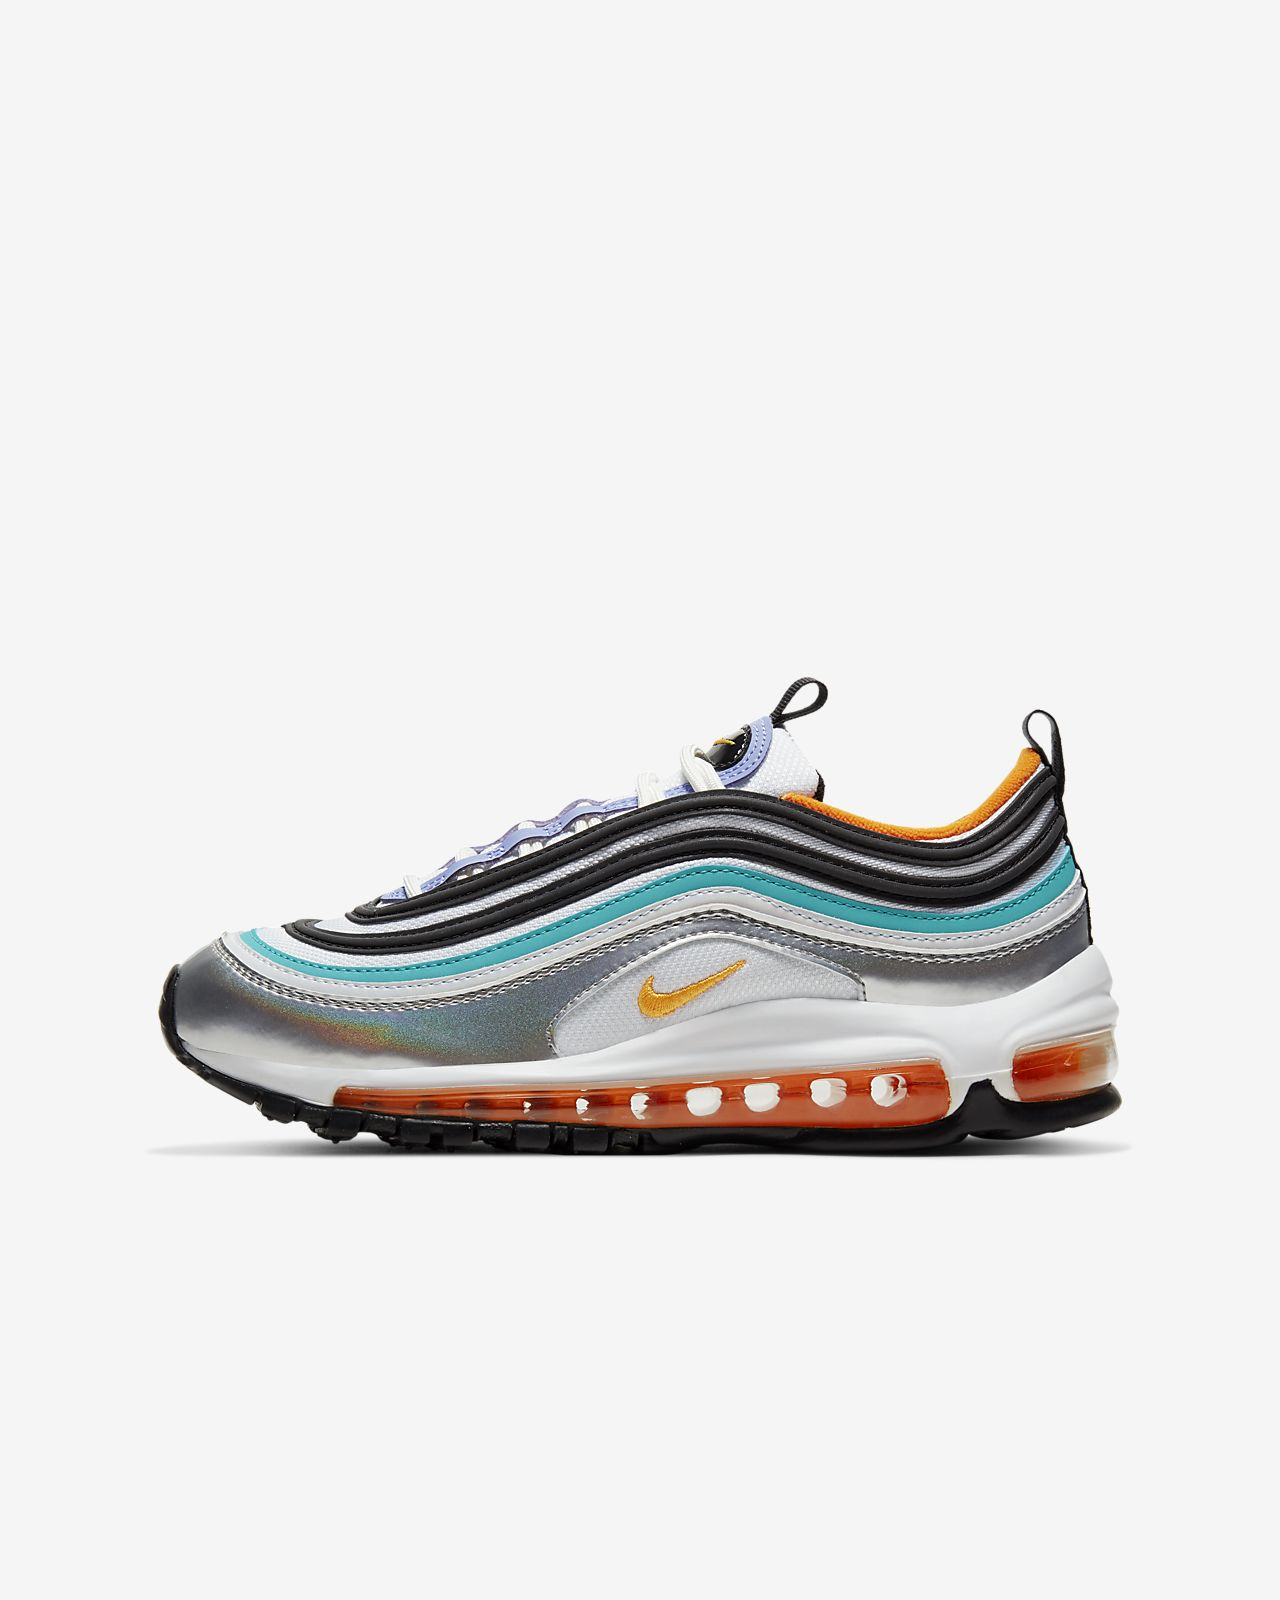 Nike Air Max 97 DTN Big Kids' Shoe